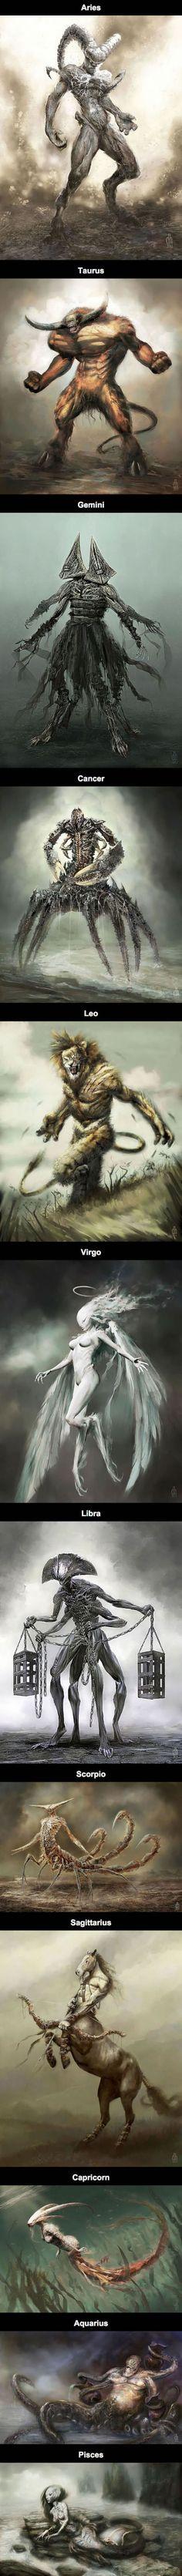 What's your sign? Mine's Aquarius (12 Zodiac Monsters By Damon Hellandbrand)